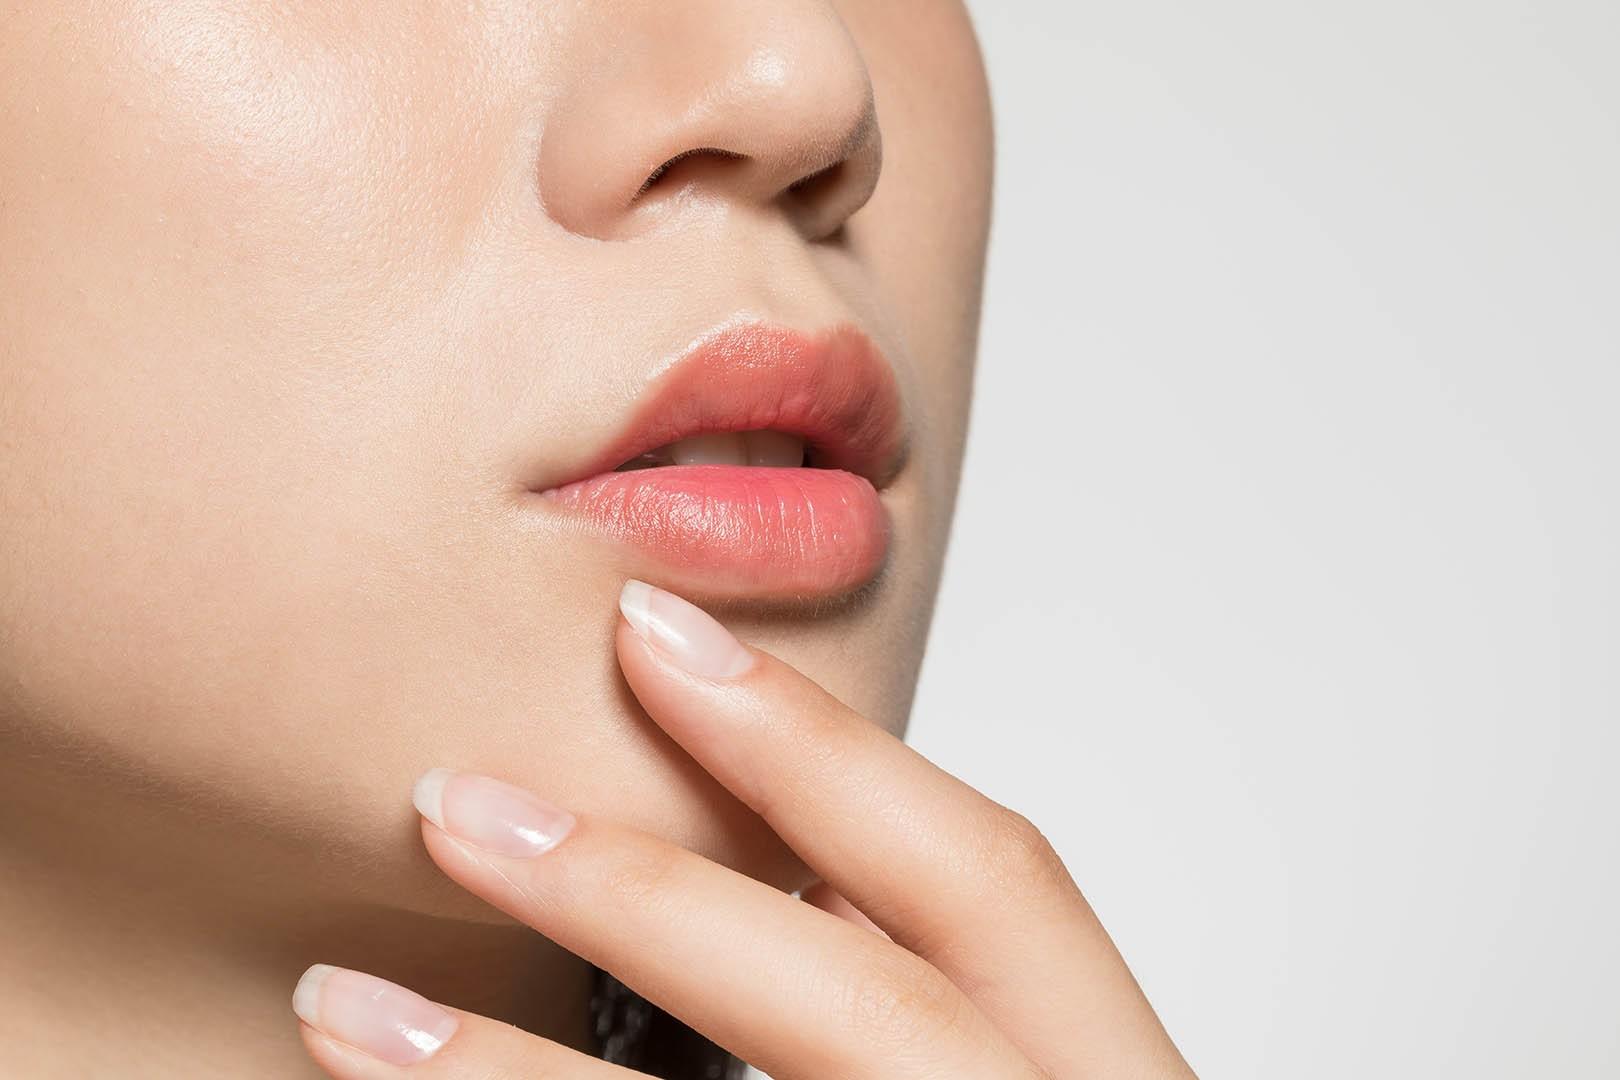 9 Cara Memerahkan Bibir secara Alami dengan Tepat dan Mudah - Jovee